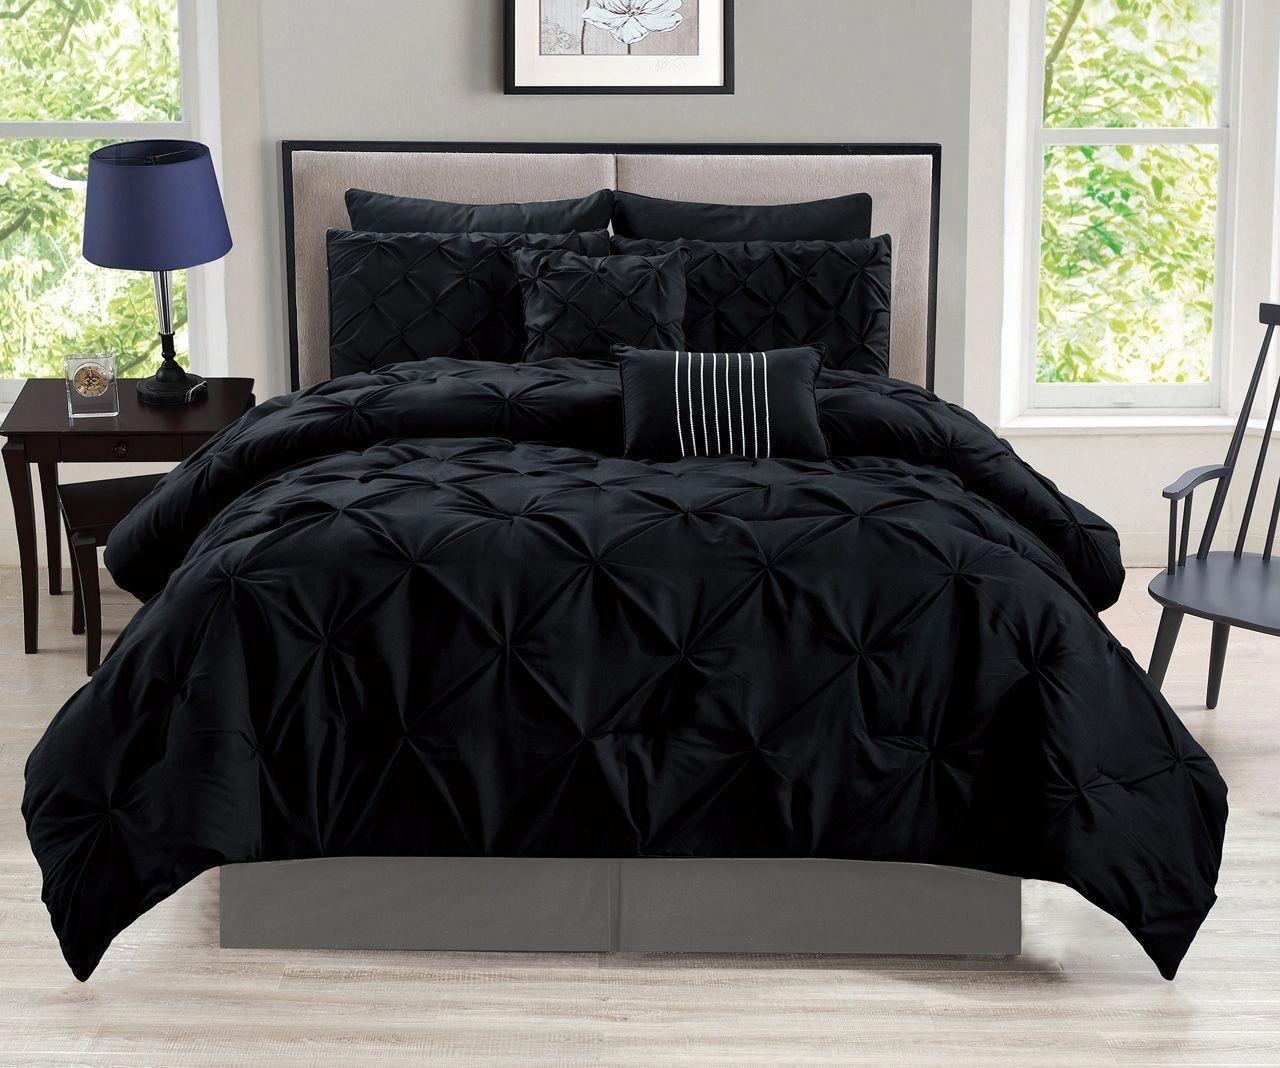 Bedroom Ideas Comfy Design Example Stop By This Styling Number 8488000410 Now Beautifulbedroomideasinspir Black Comforter Sets Black Bed Set Comforter Sets